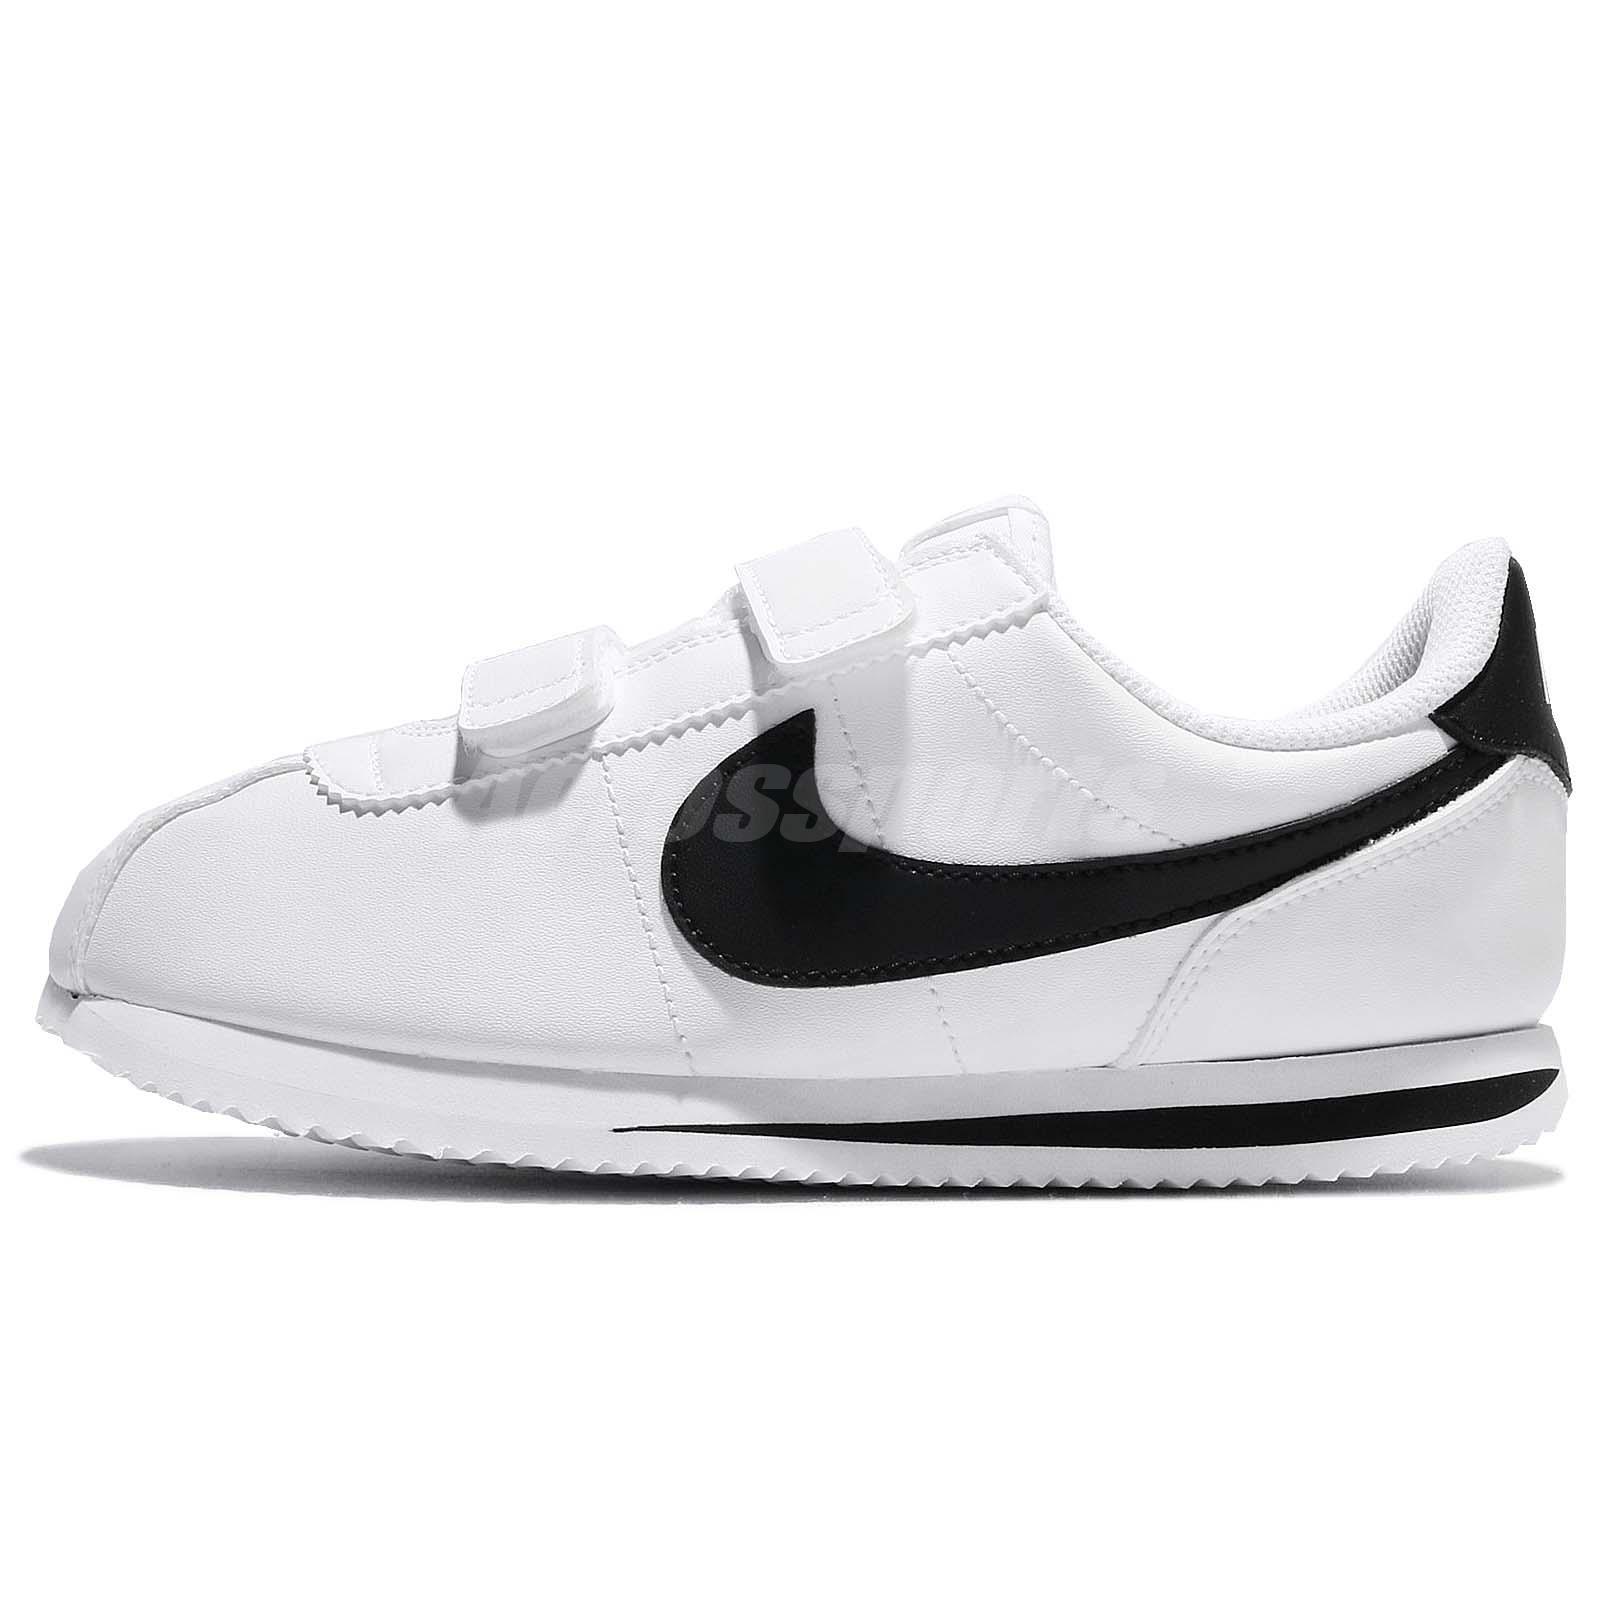 new styles c0367 c2d24 Nike Cortez Basic SL PSV White Black Preschool Boys Grils Running 904767-102